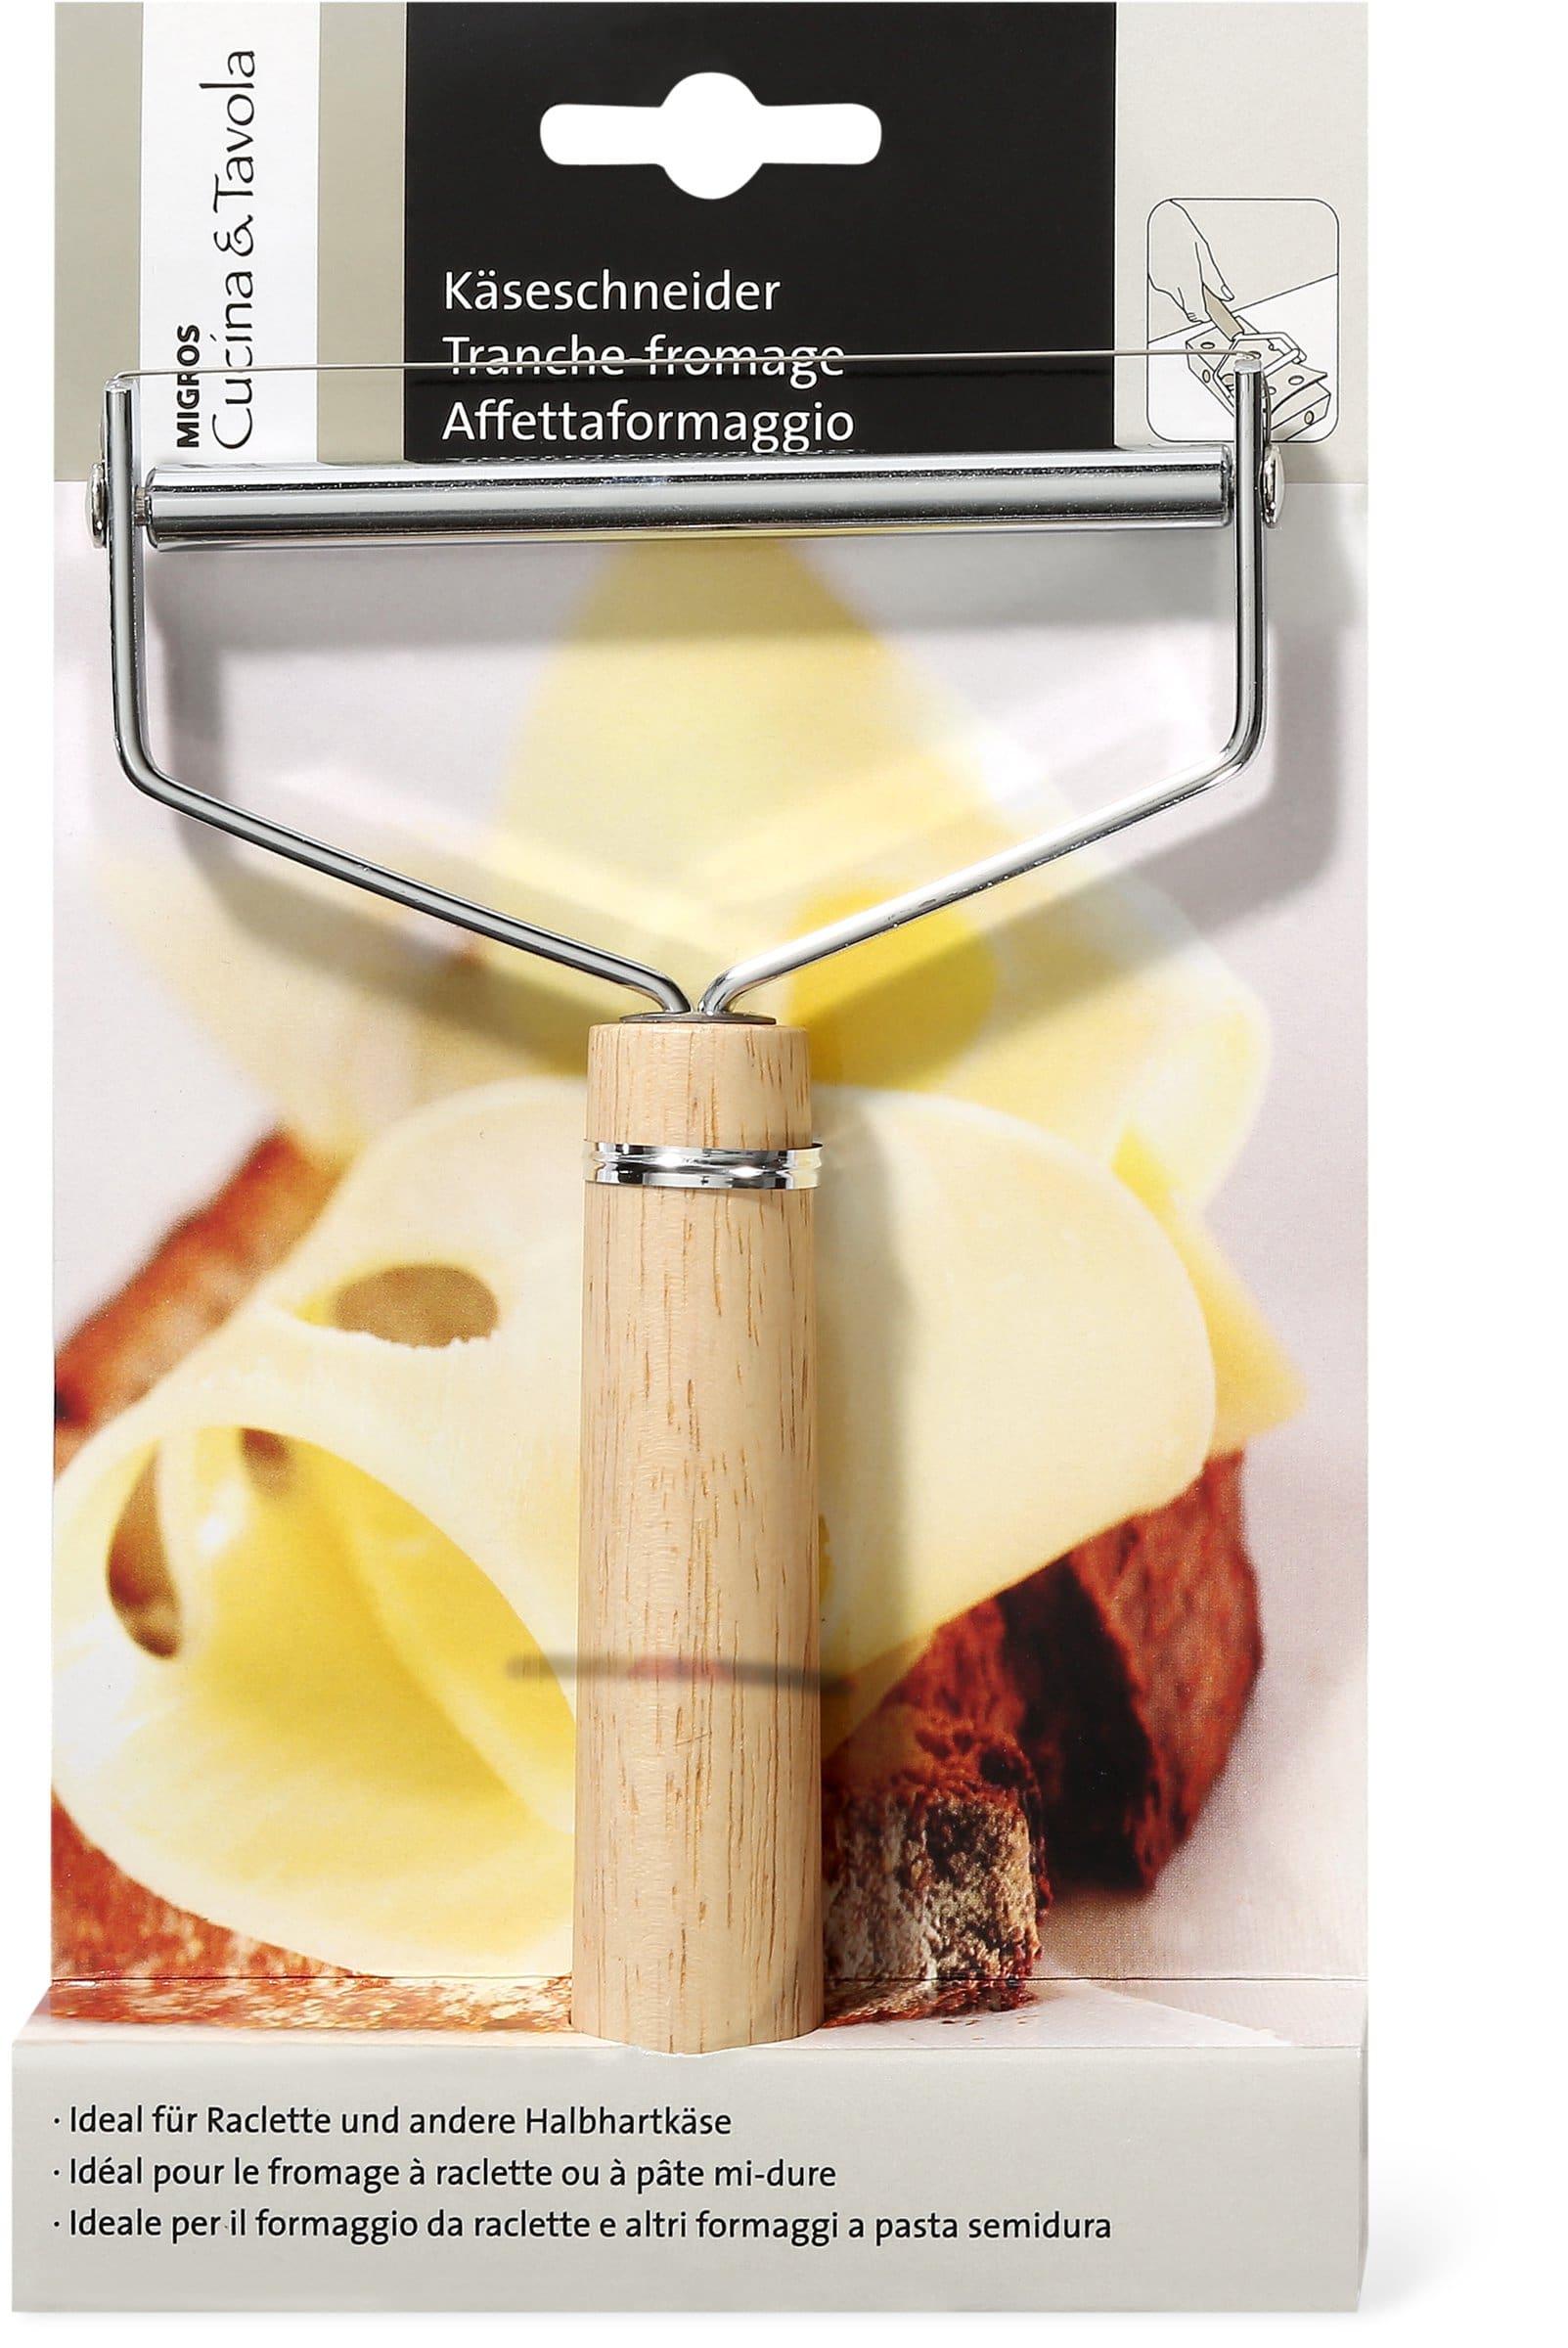 Cucina & Tavola Tranche-fromage